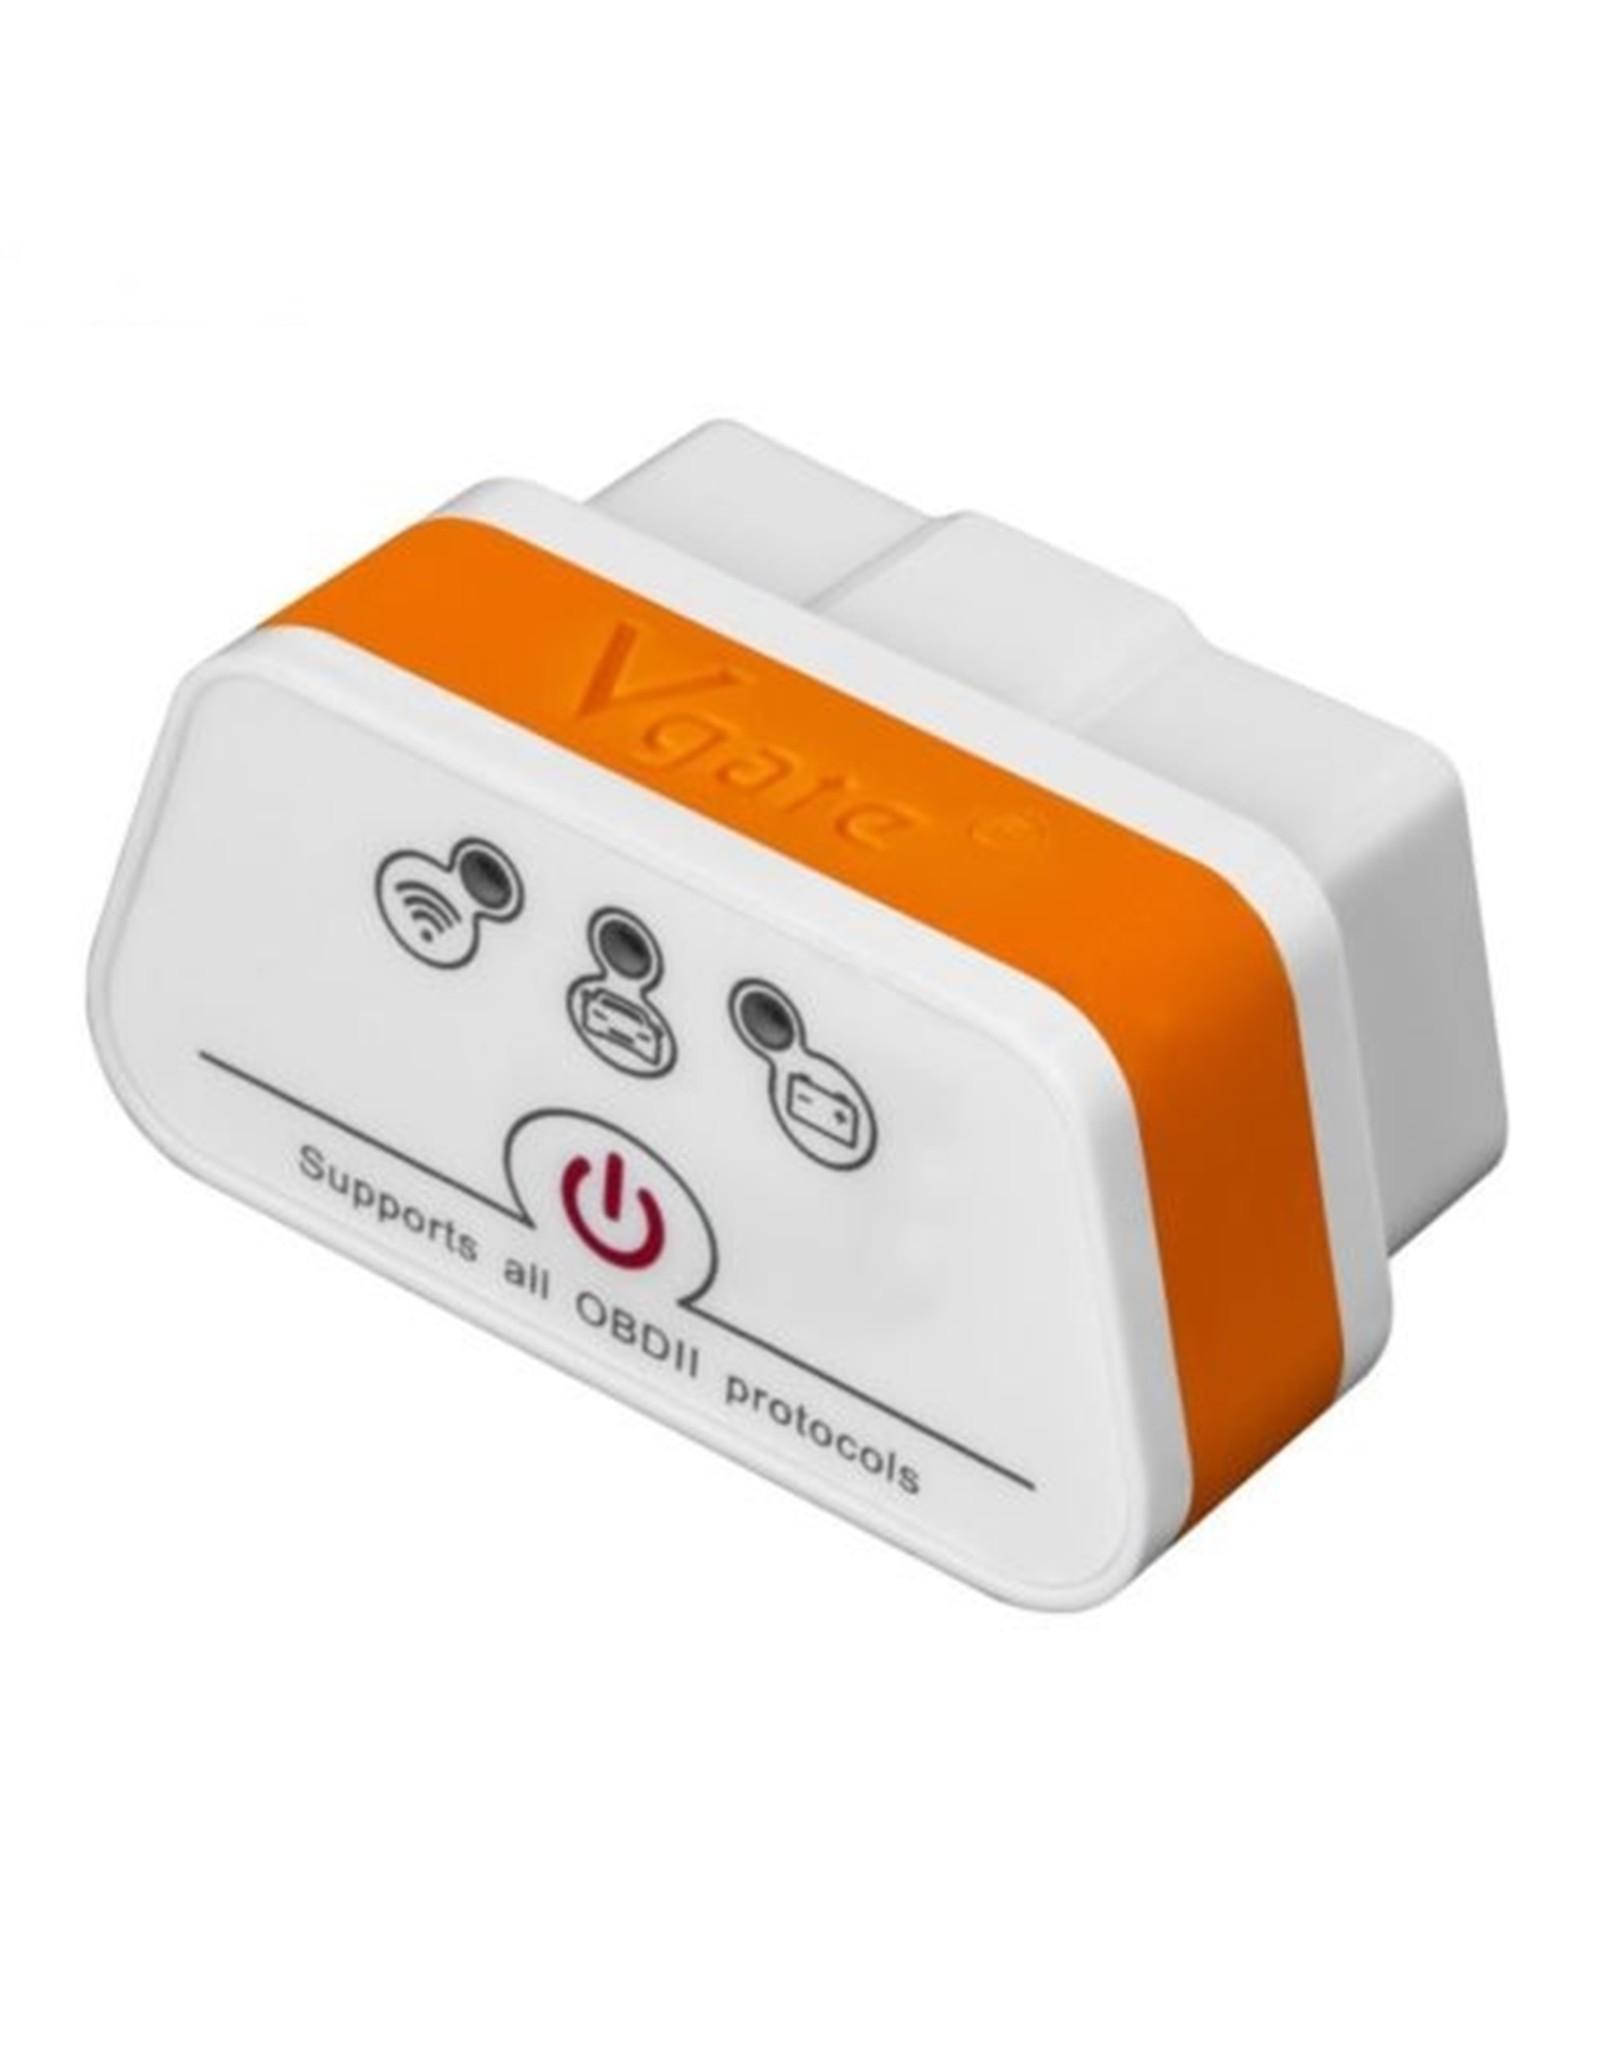 Merkloos Vgate iCar2 - ELM327 – OBD2 - WIFI - Scan Diagnose Tool (GESCHIKT VOOR IPHONE/ IOS SYSTEMEN)